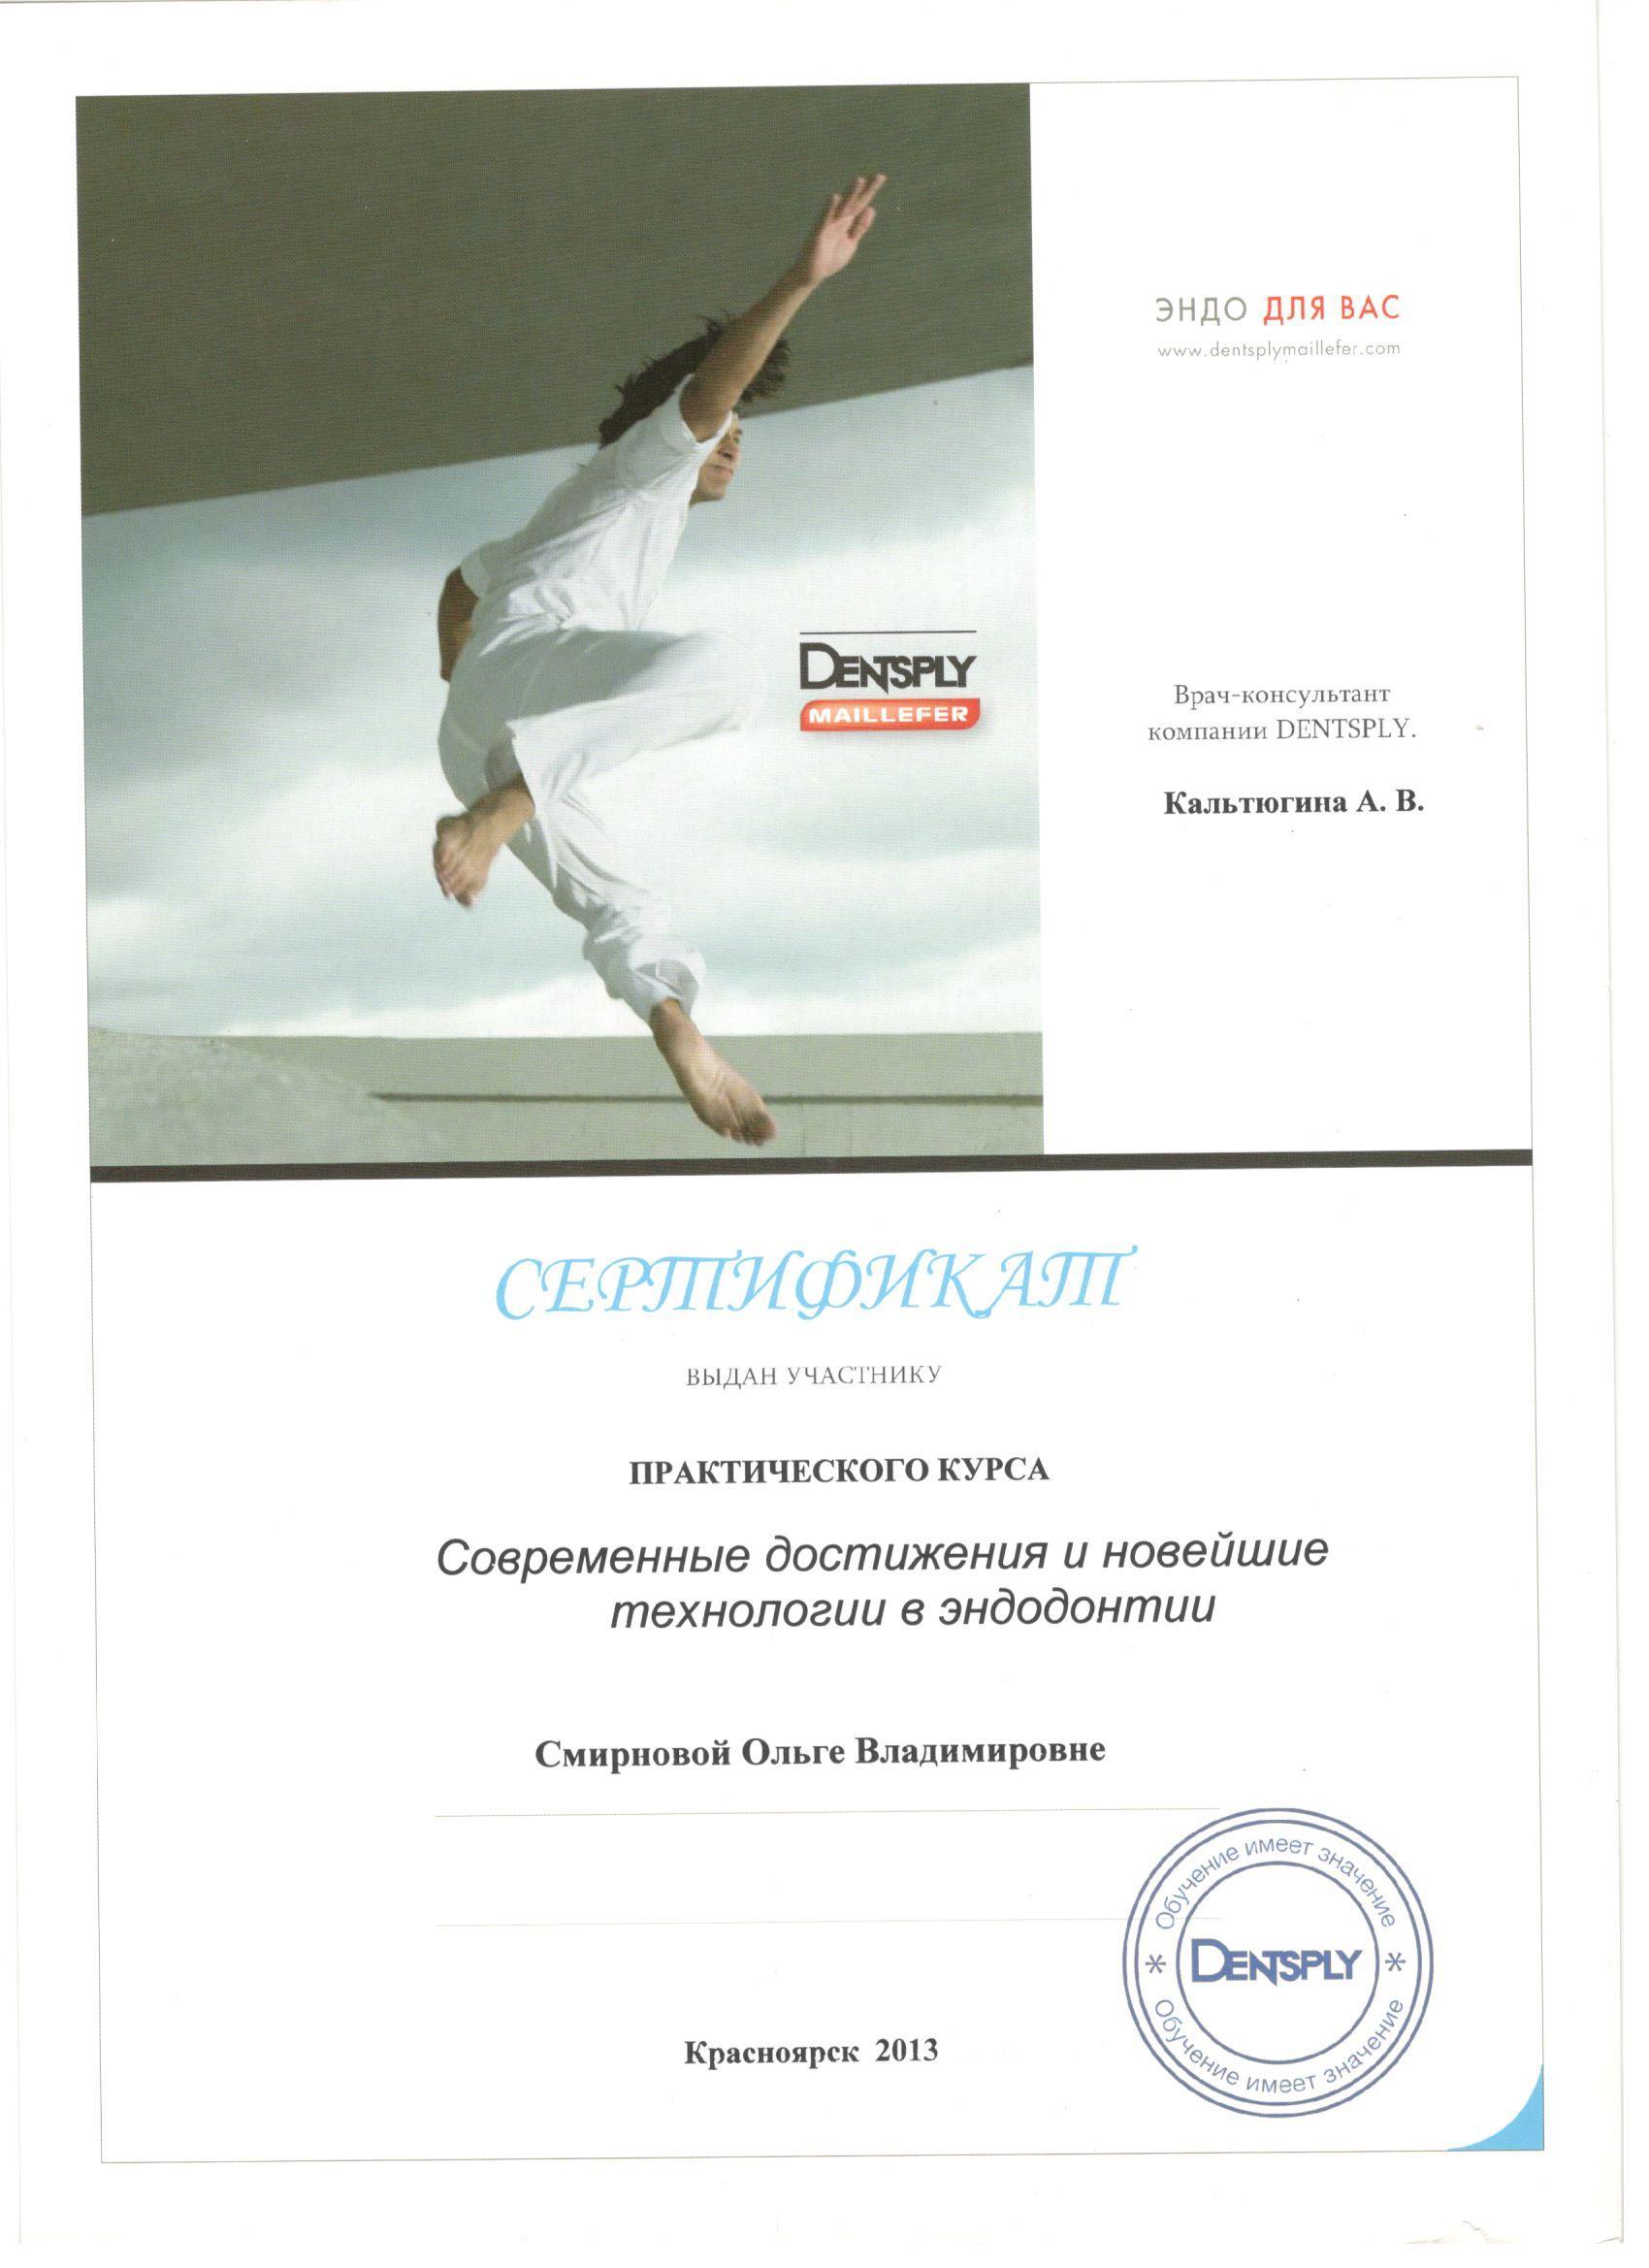 Сертификат 010